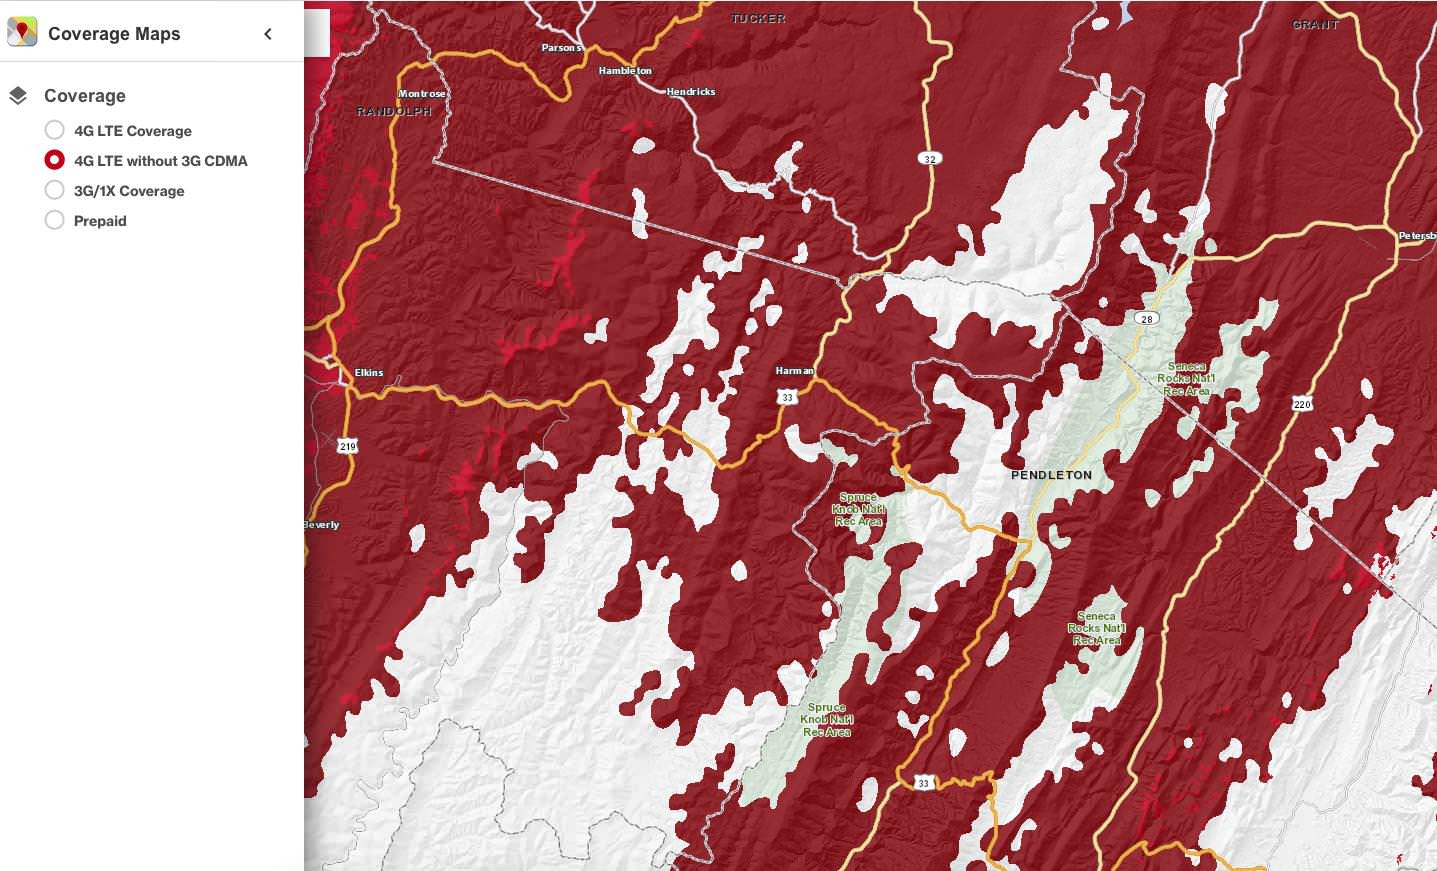 Verizon Coverage Map Shows At&t Roaming - Verizon Coverage Map In California